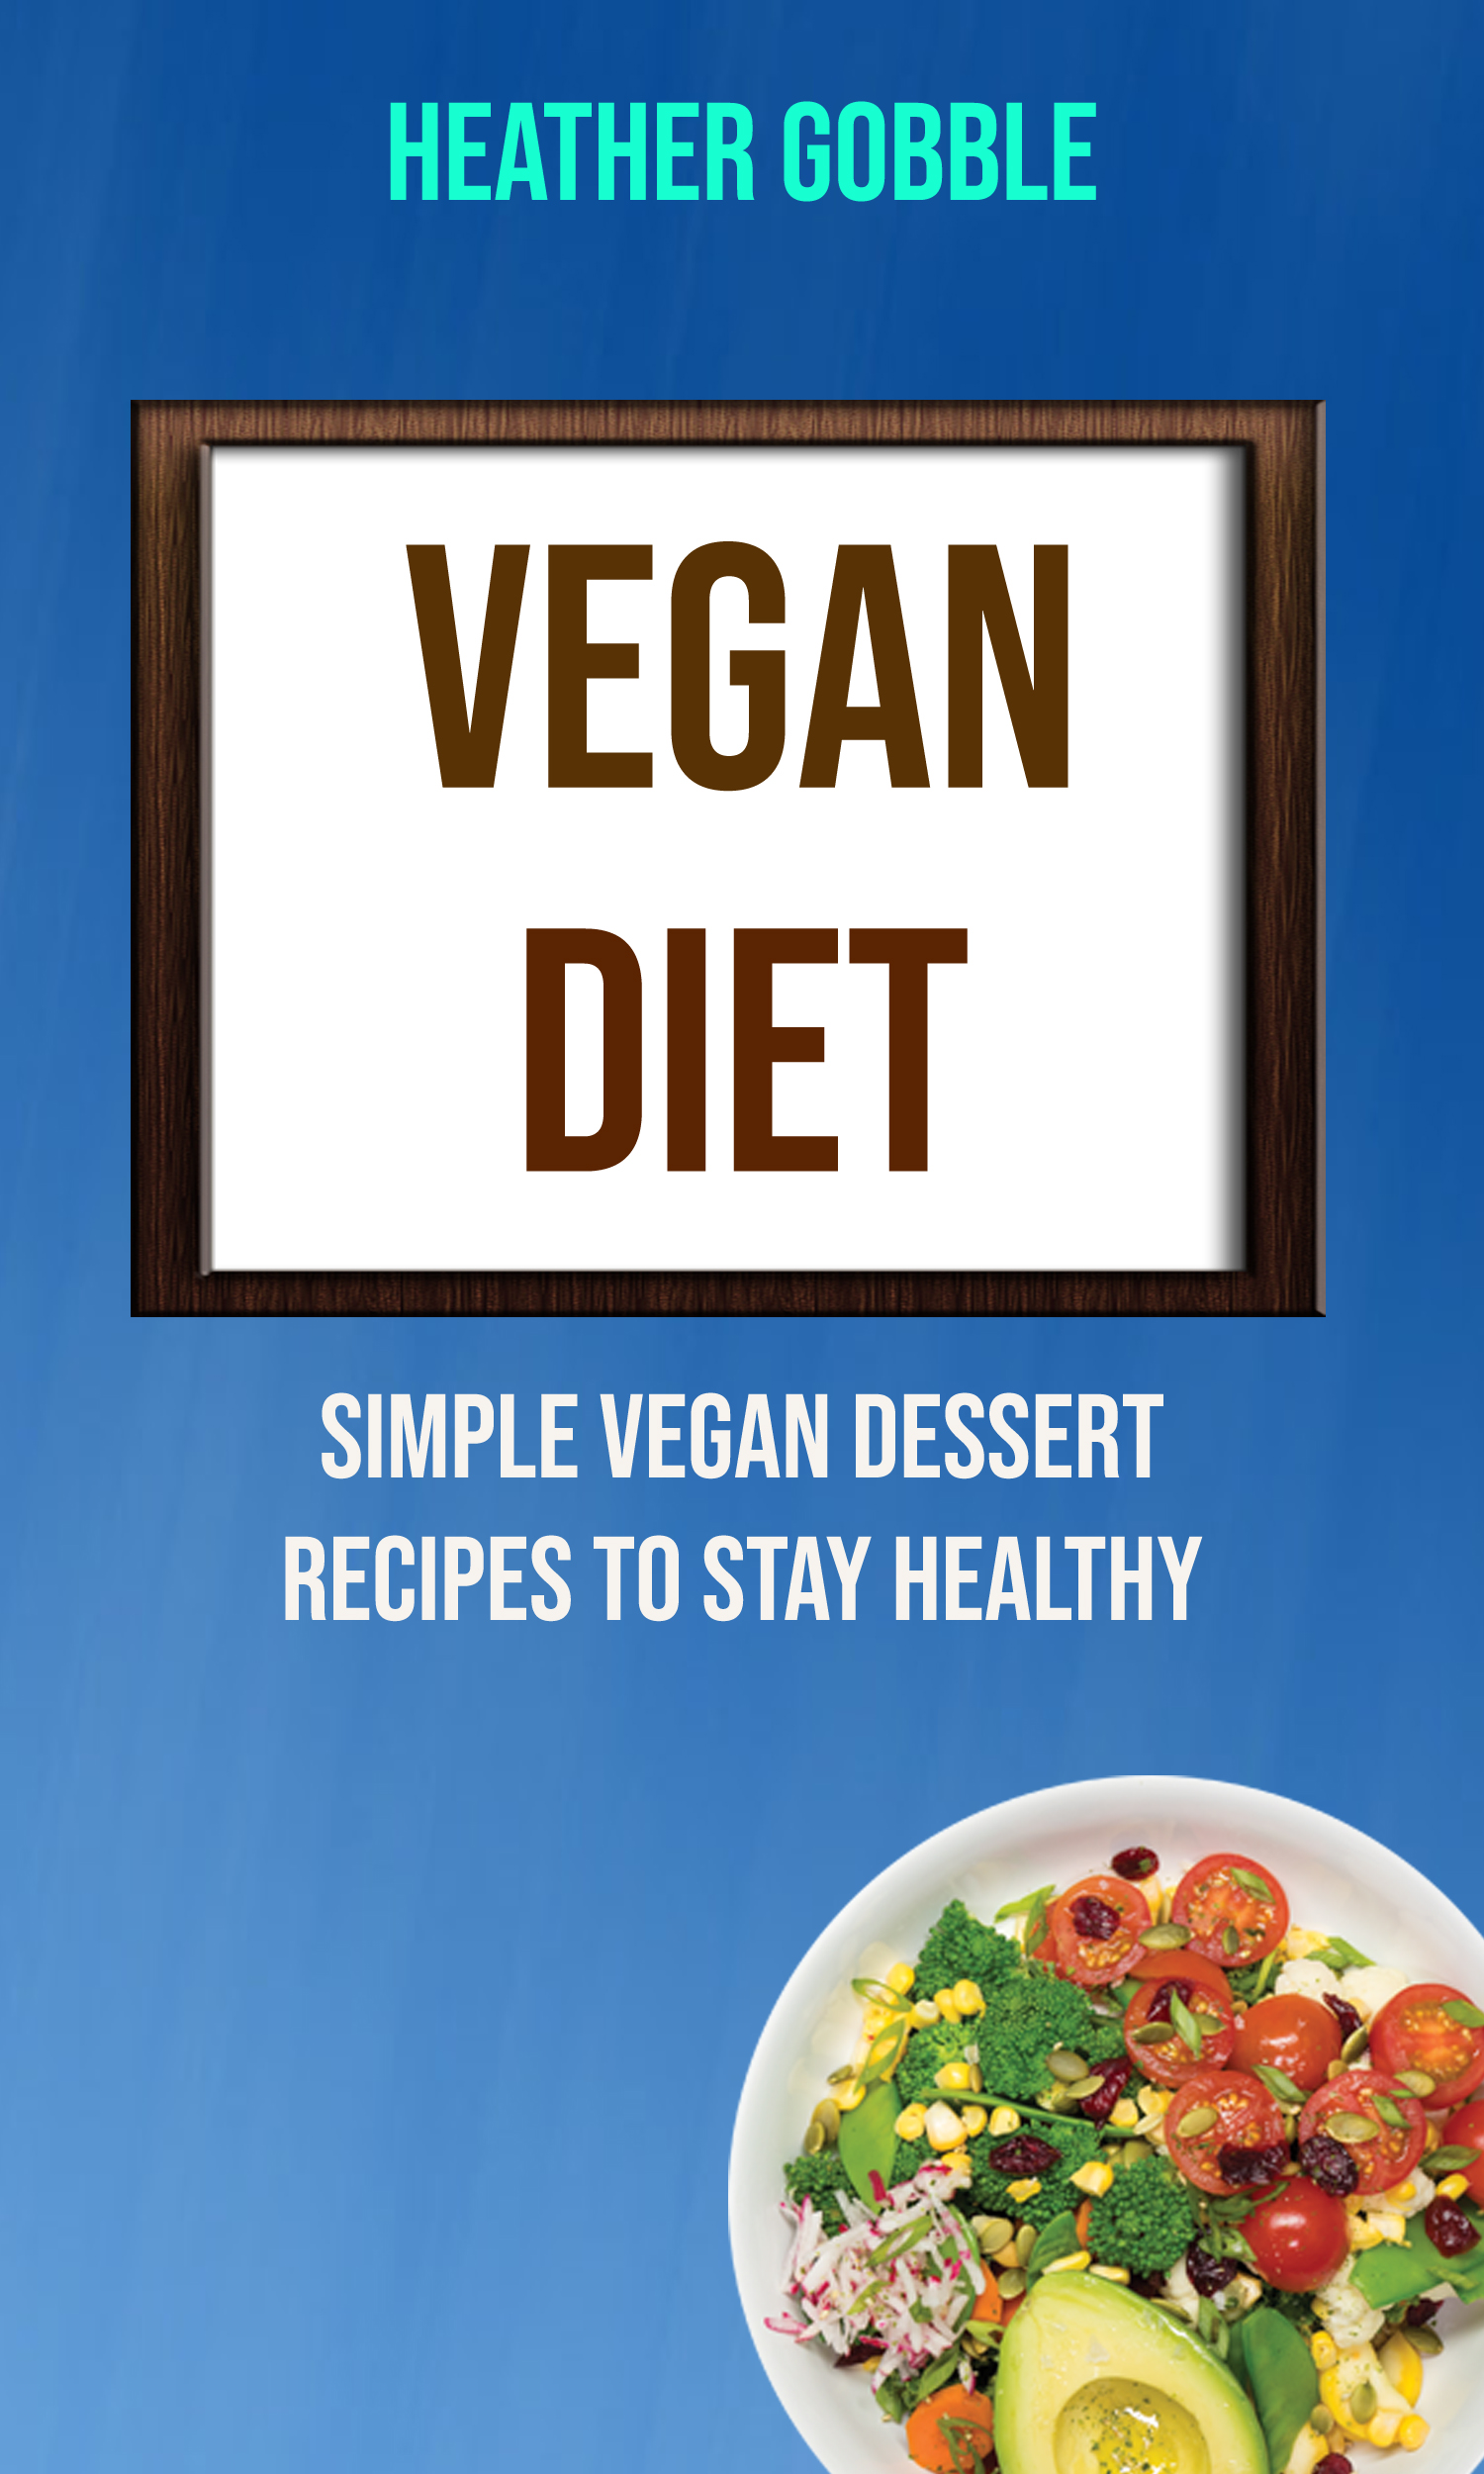 Vegan diet: simple vegan dessert recipes to stay healthy